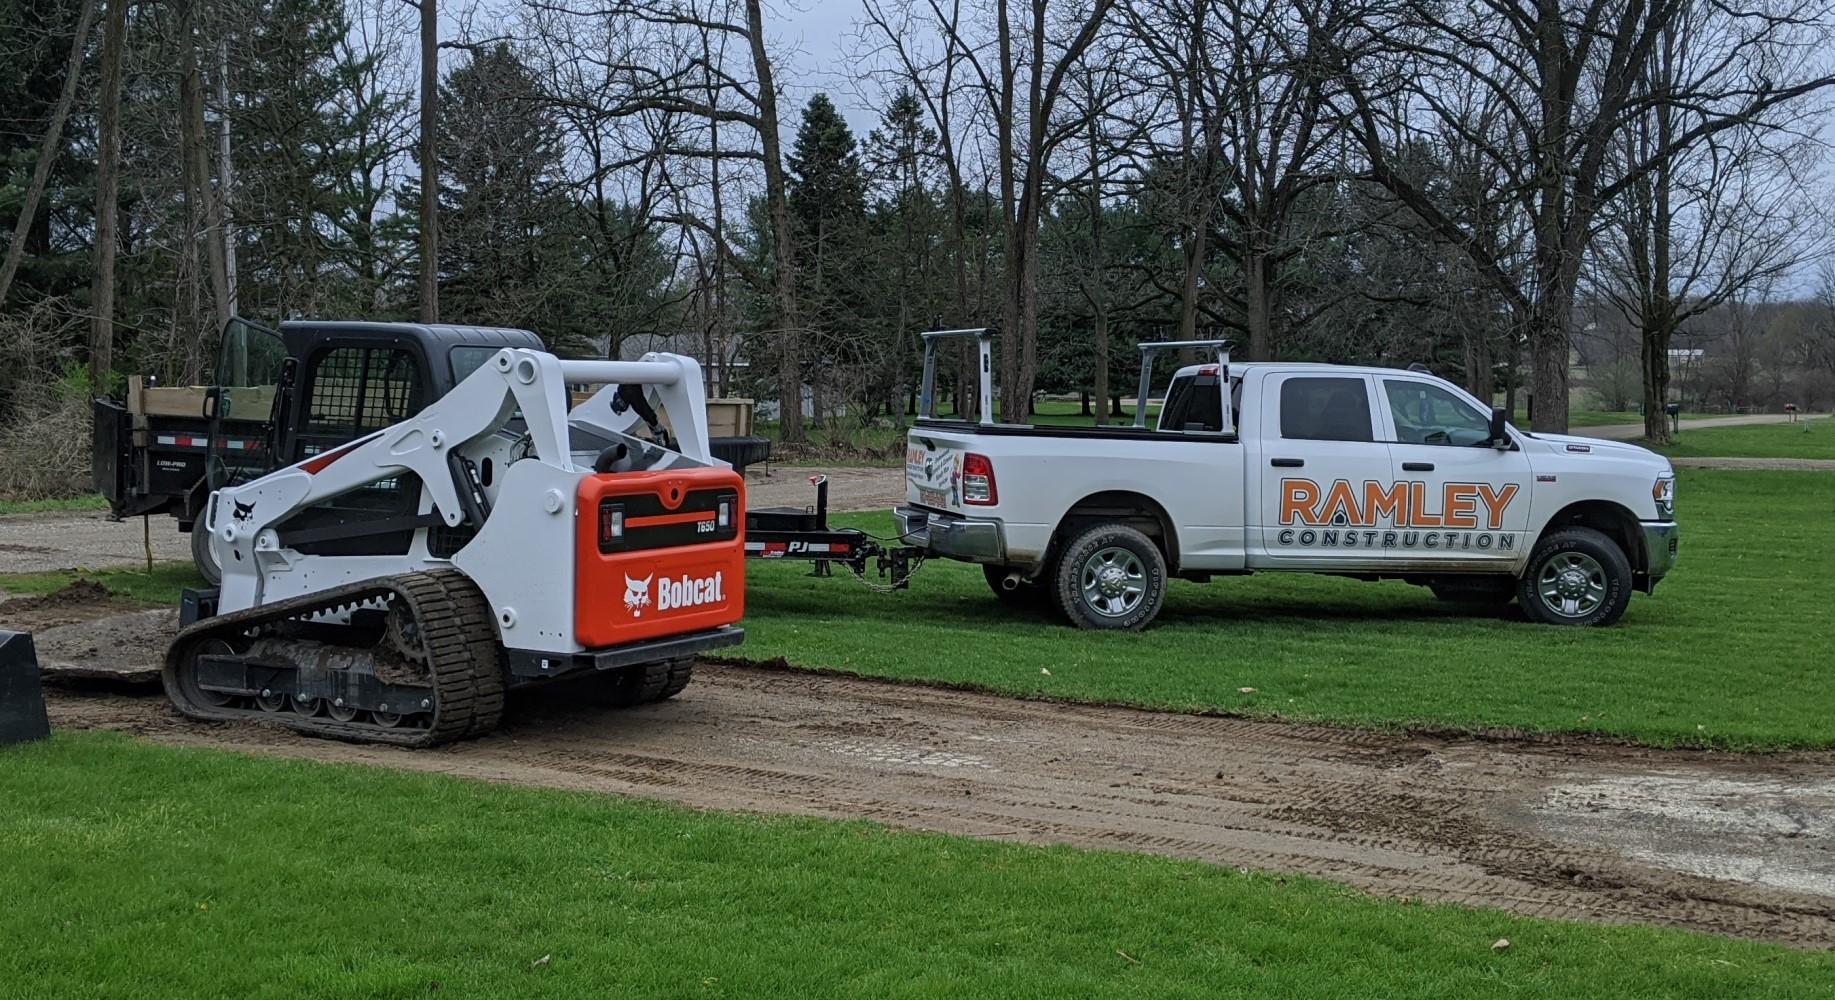 Ramley Company Construction Equipment